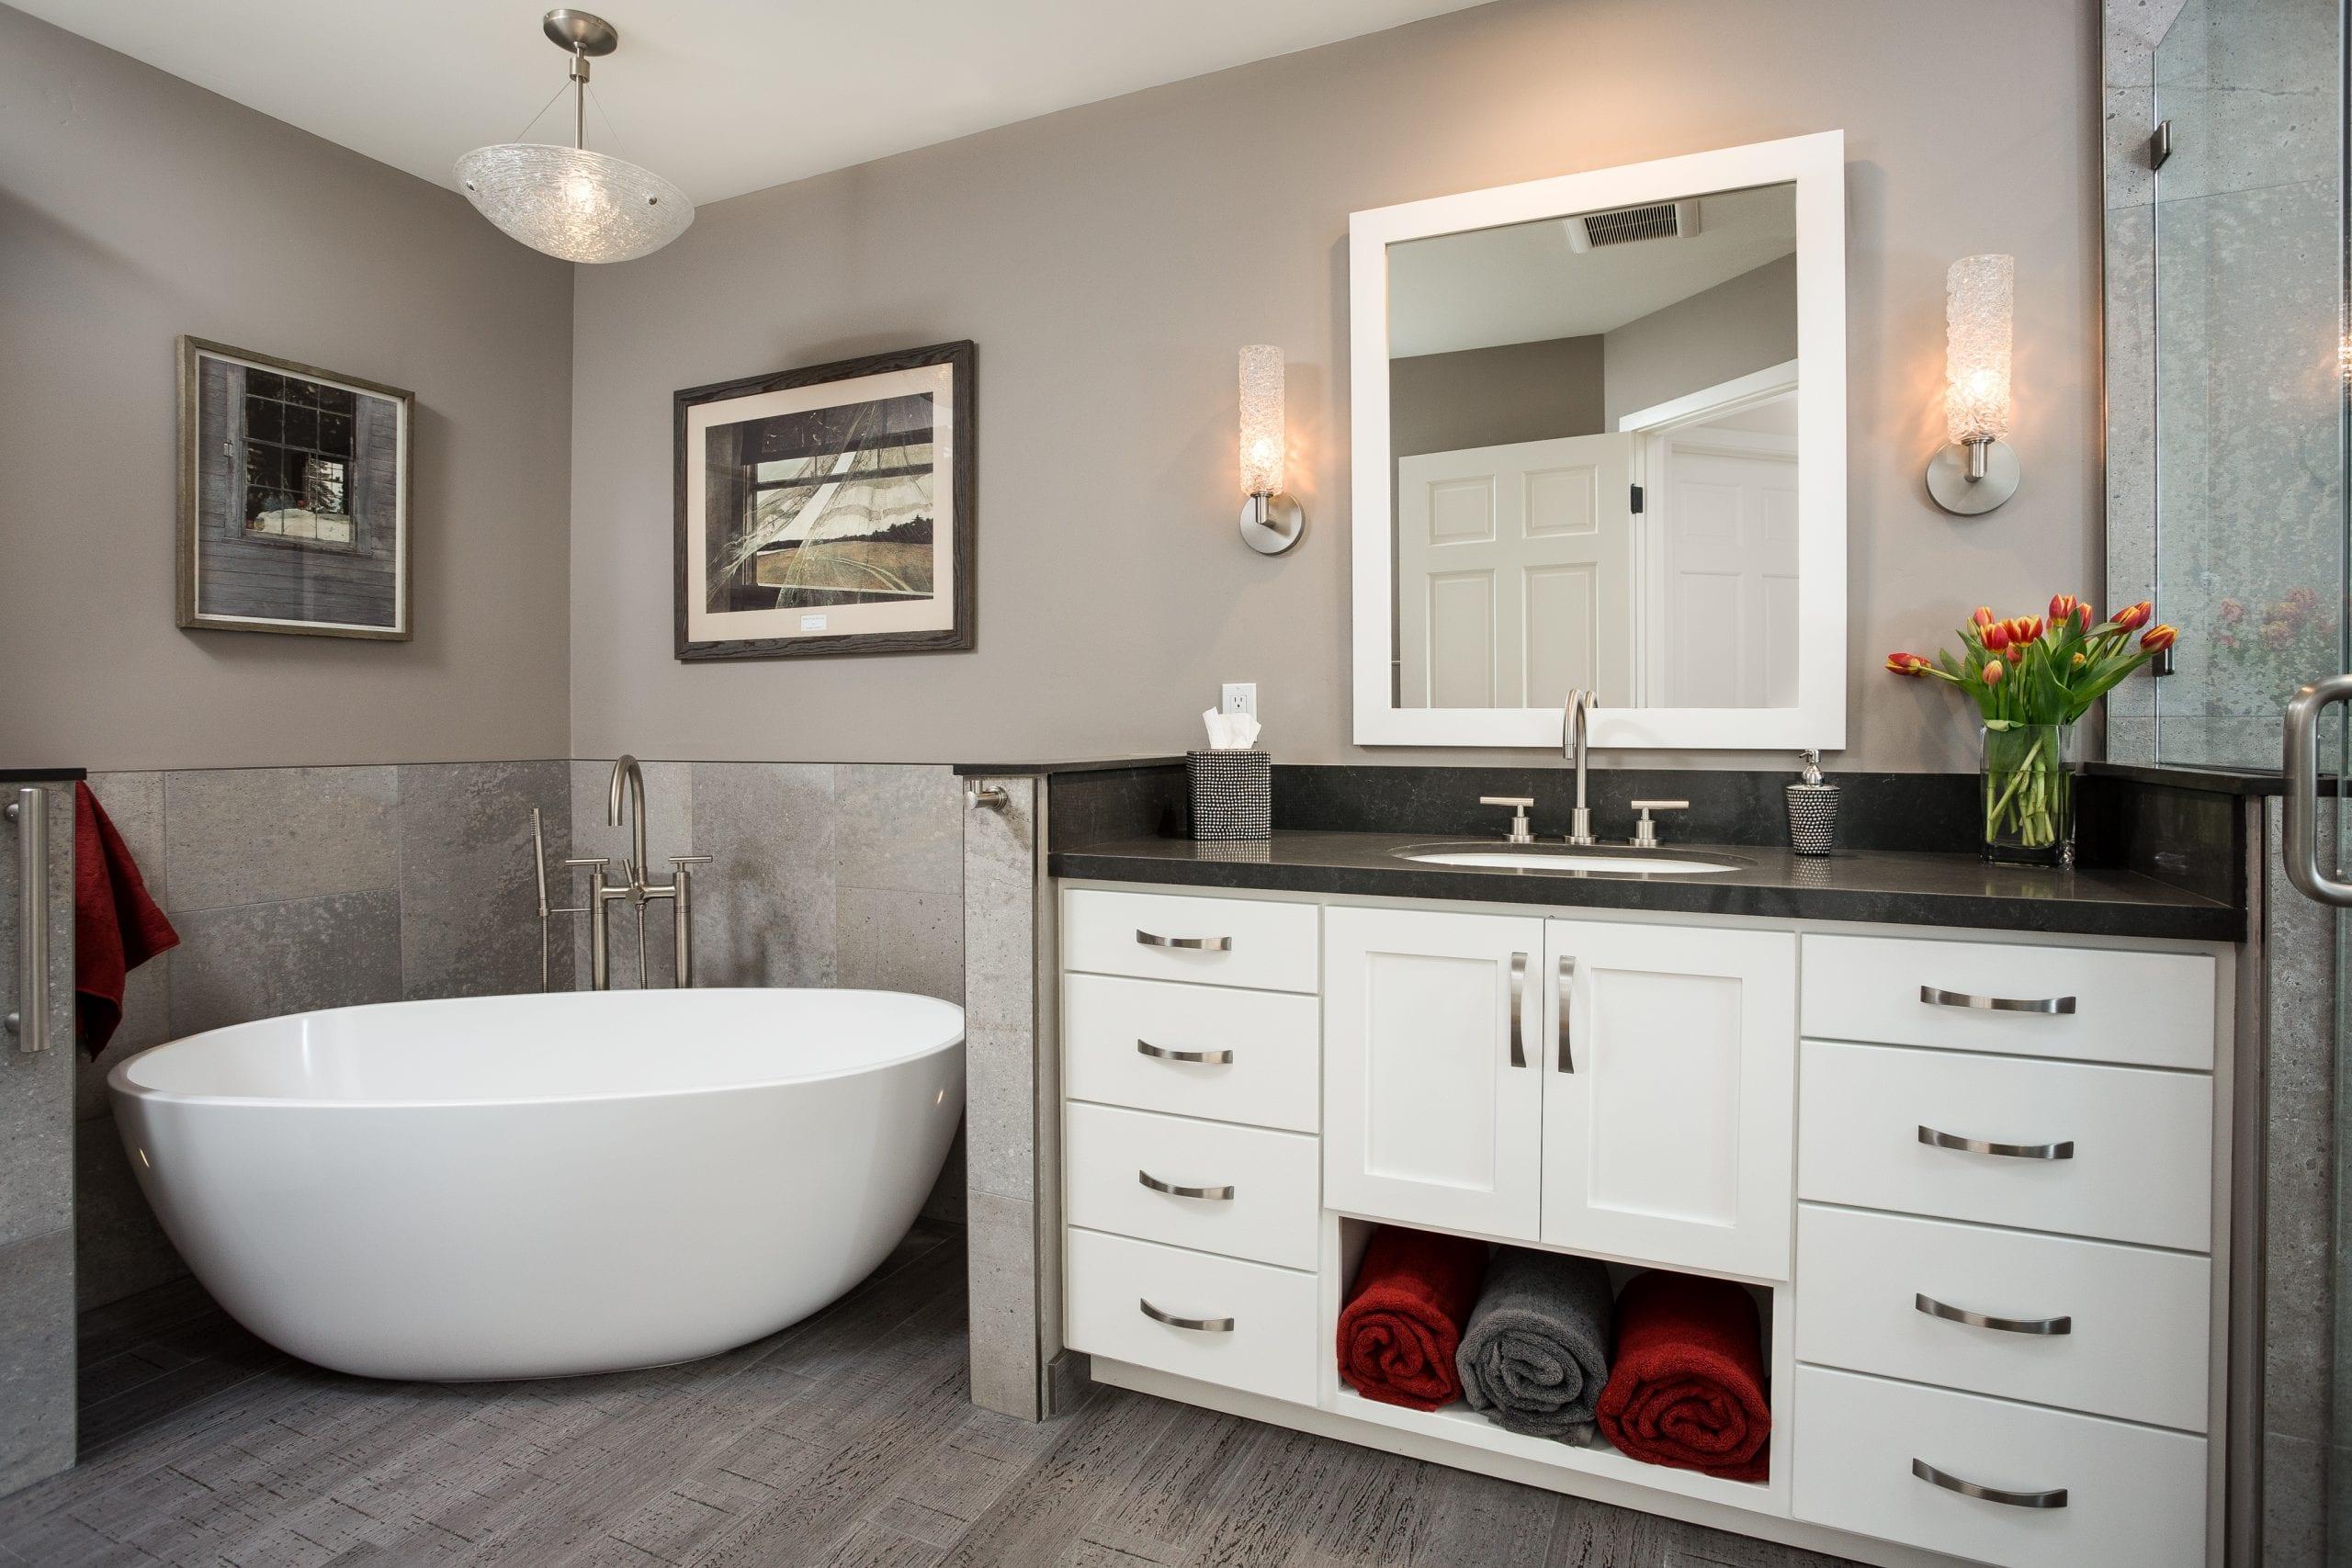 Elegant-Bathroom-Trio-Bathroom-Remodel4-scaled